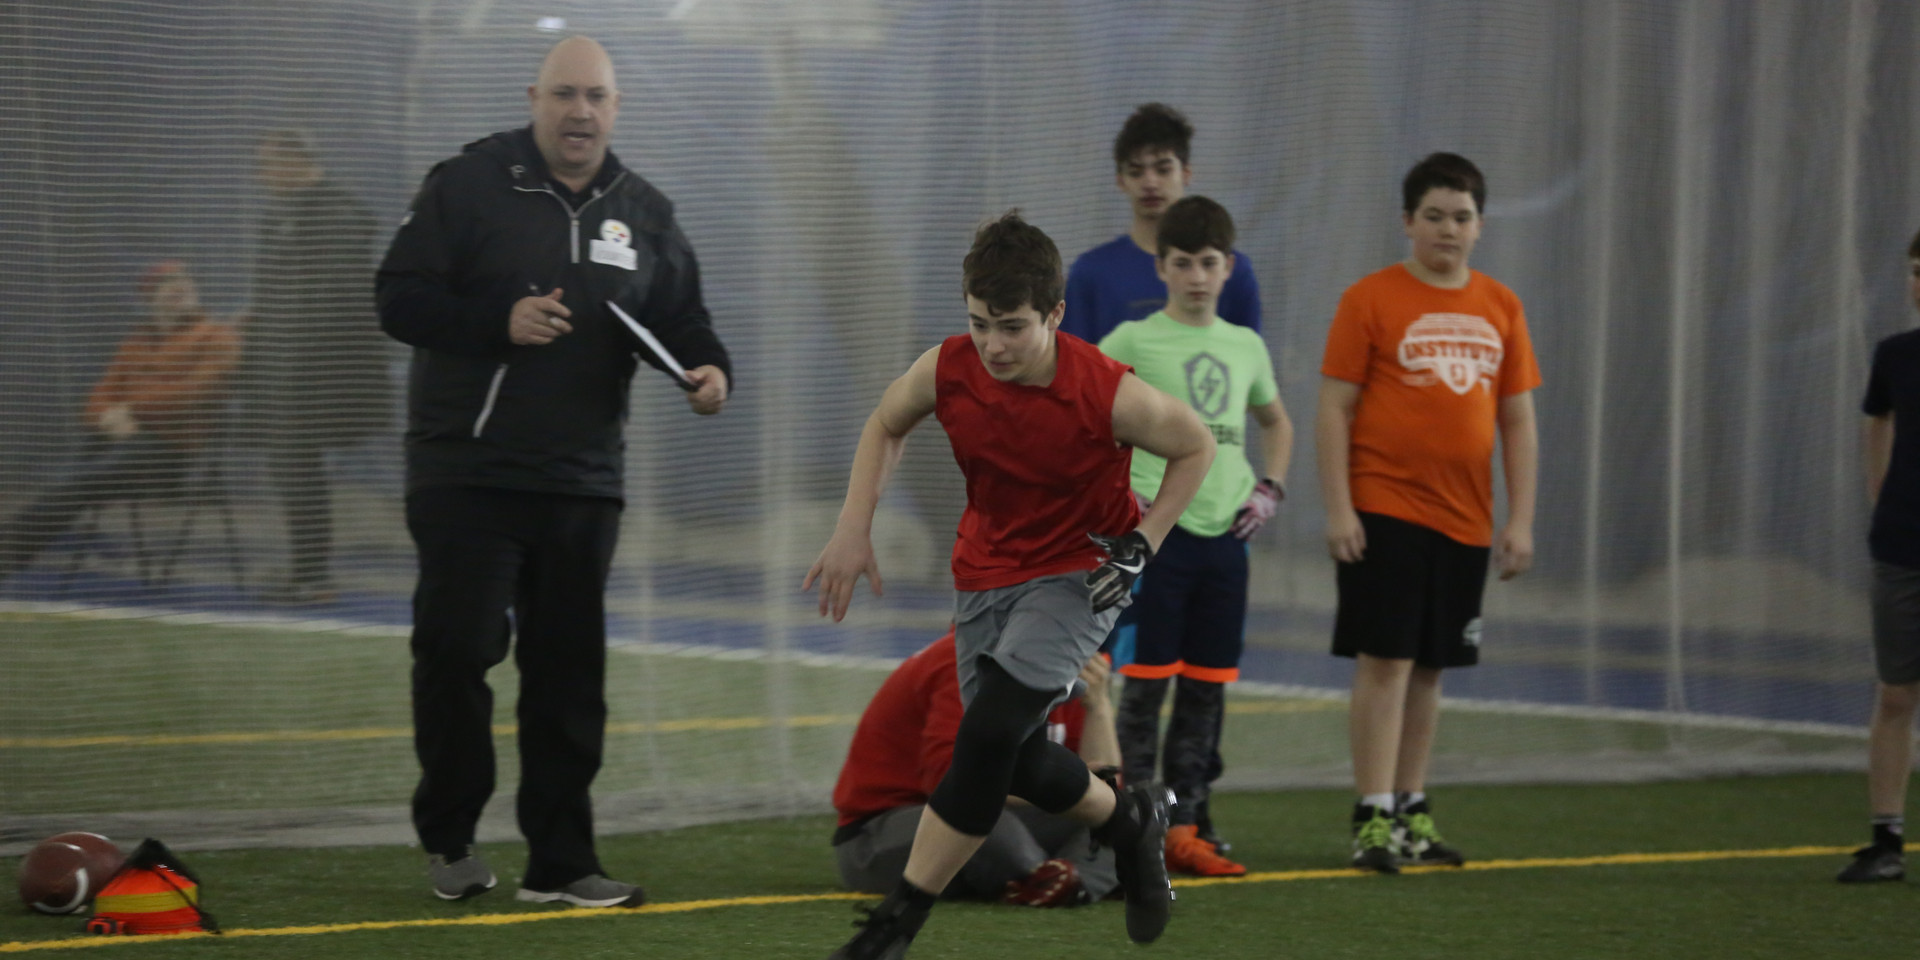 COMBINE-NCAFA-FOOTBALL-TRAINING-OTTAWA-F